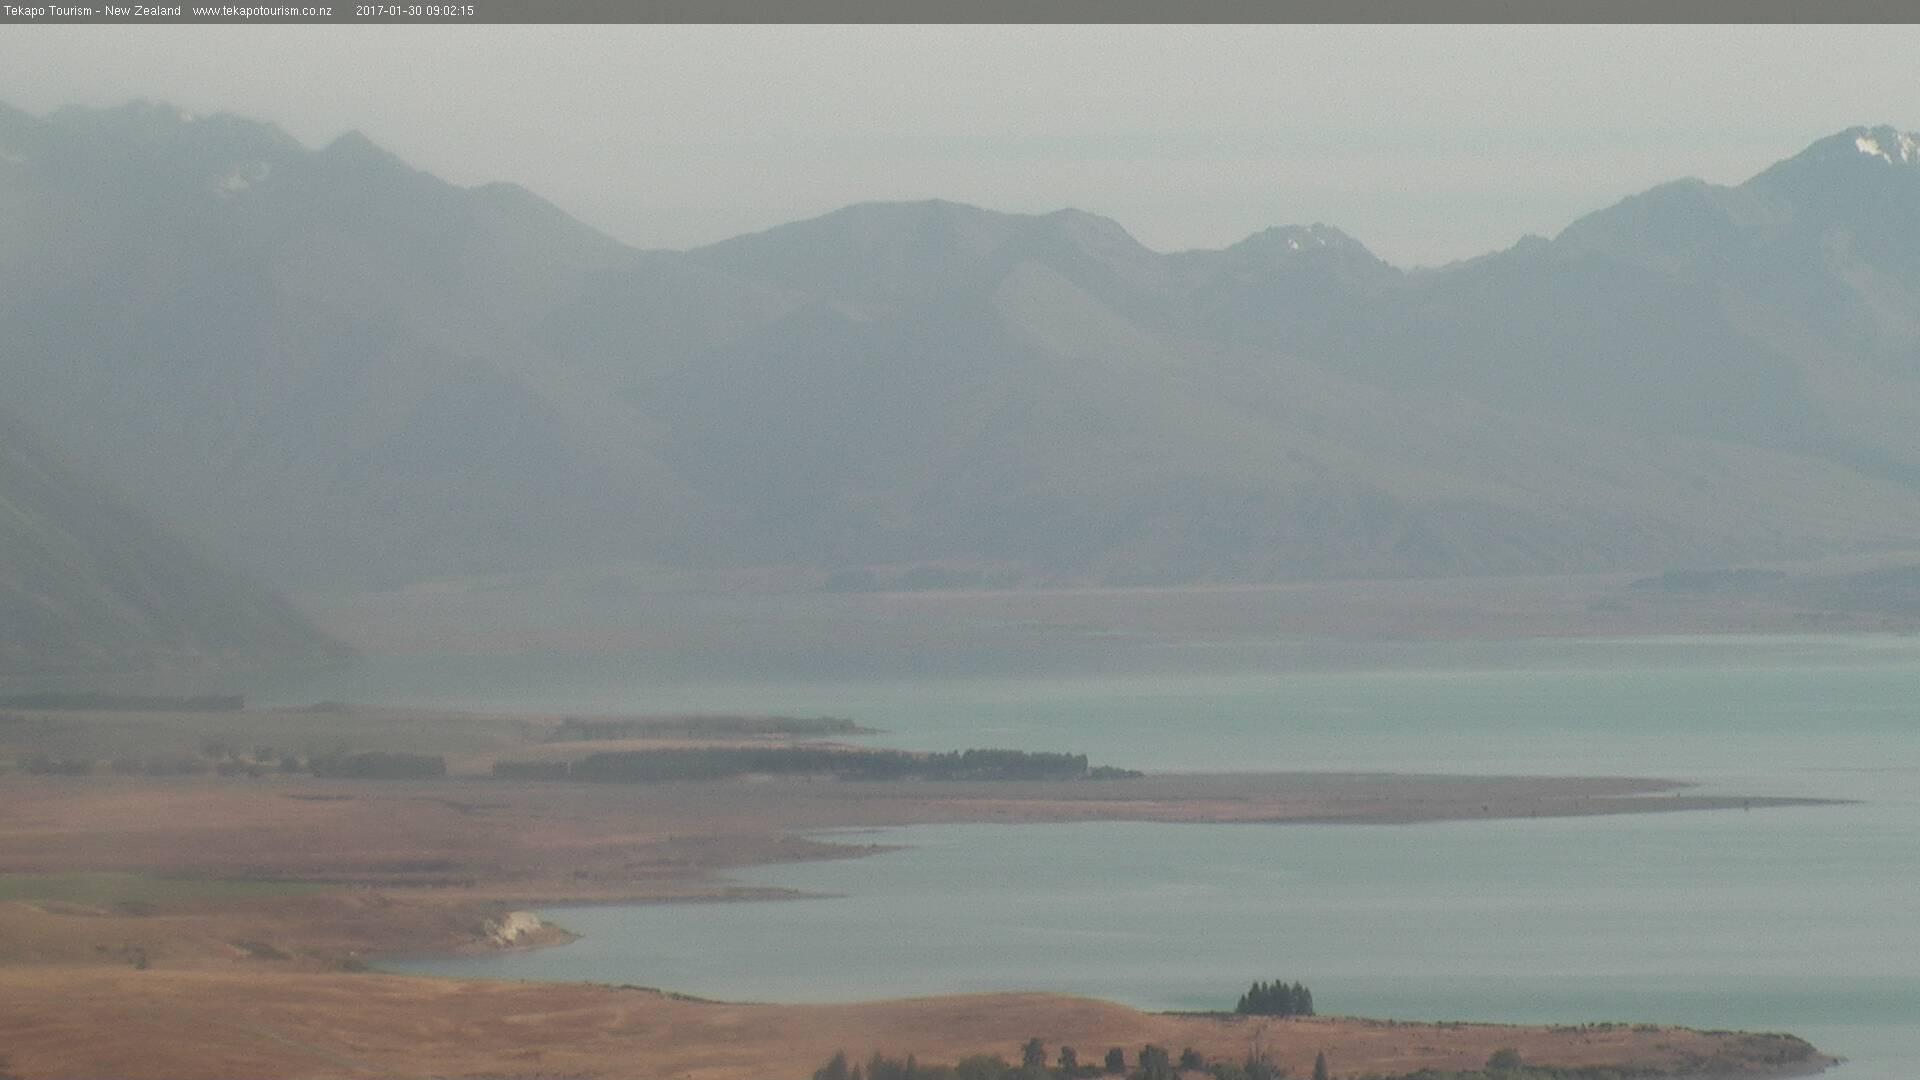 webcam Godley Valley Tekapo